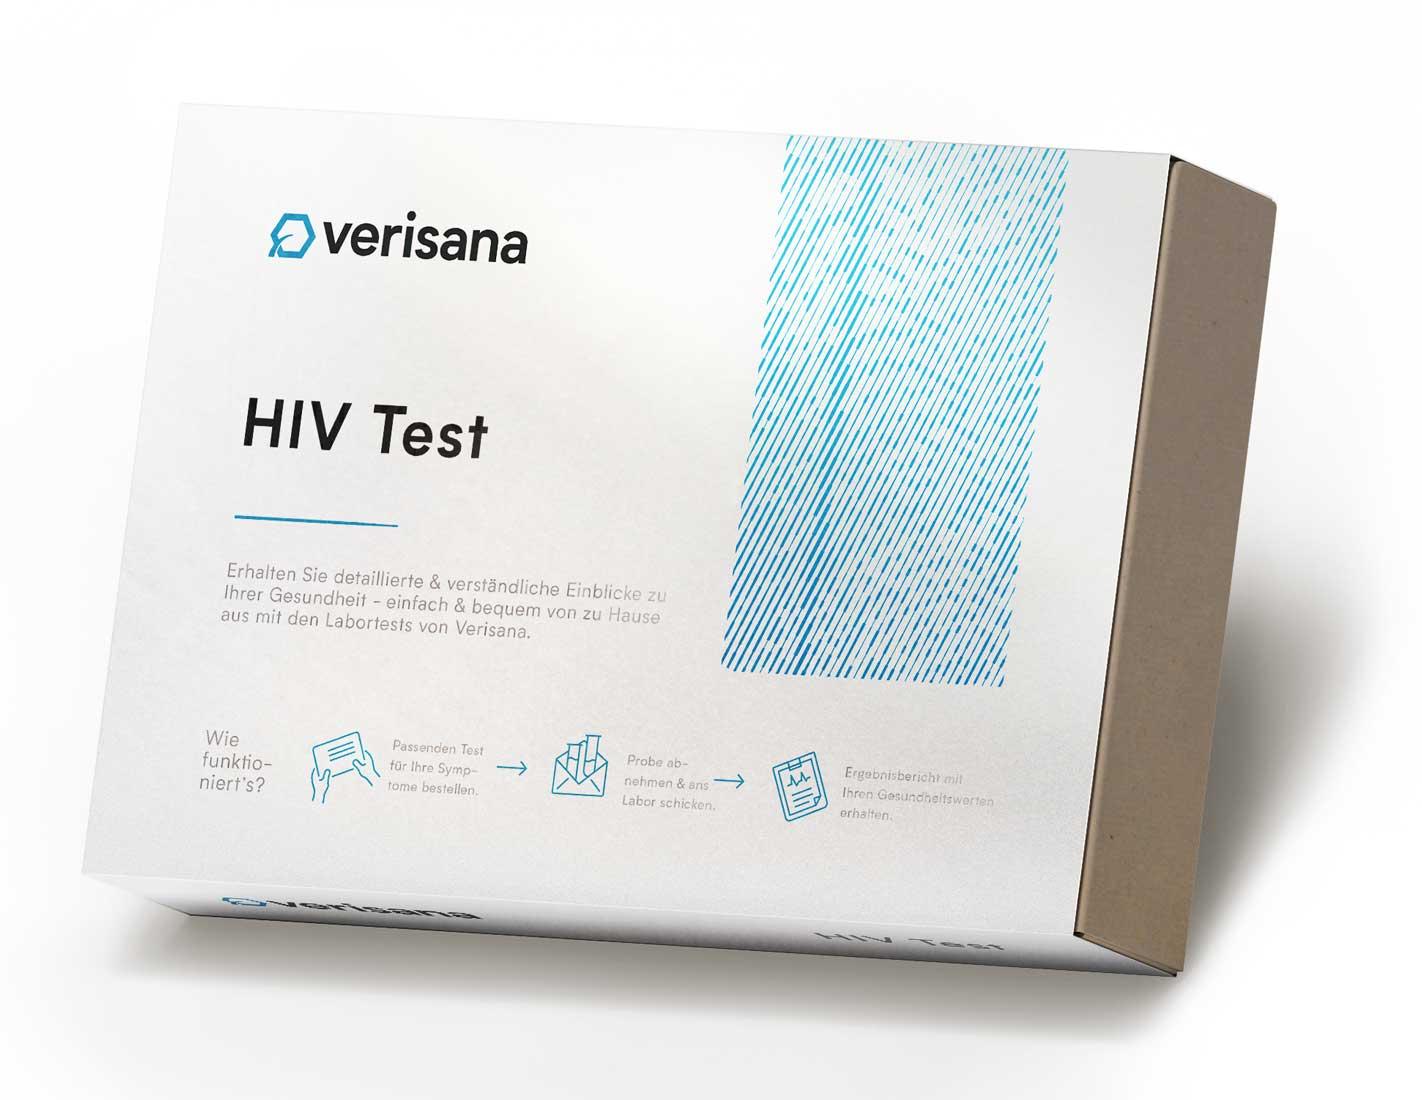 HIV Test, Bluttest